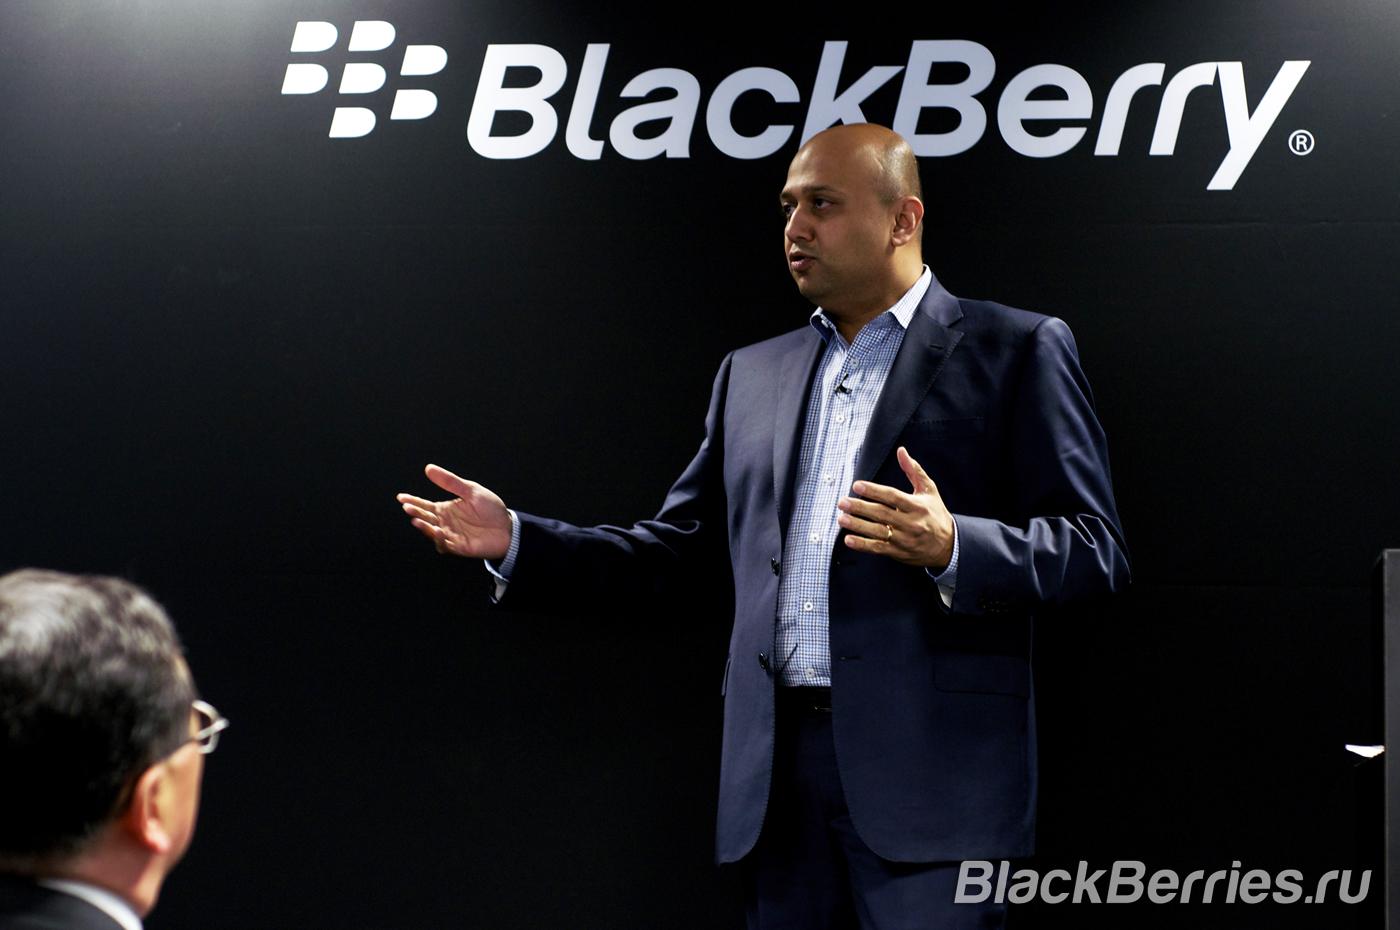 BlackBerry-MWC2015-04